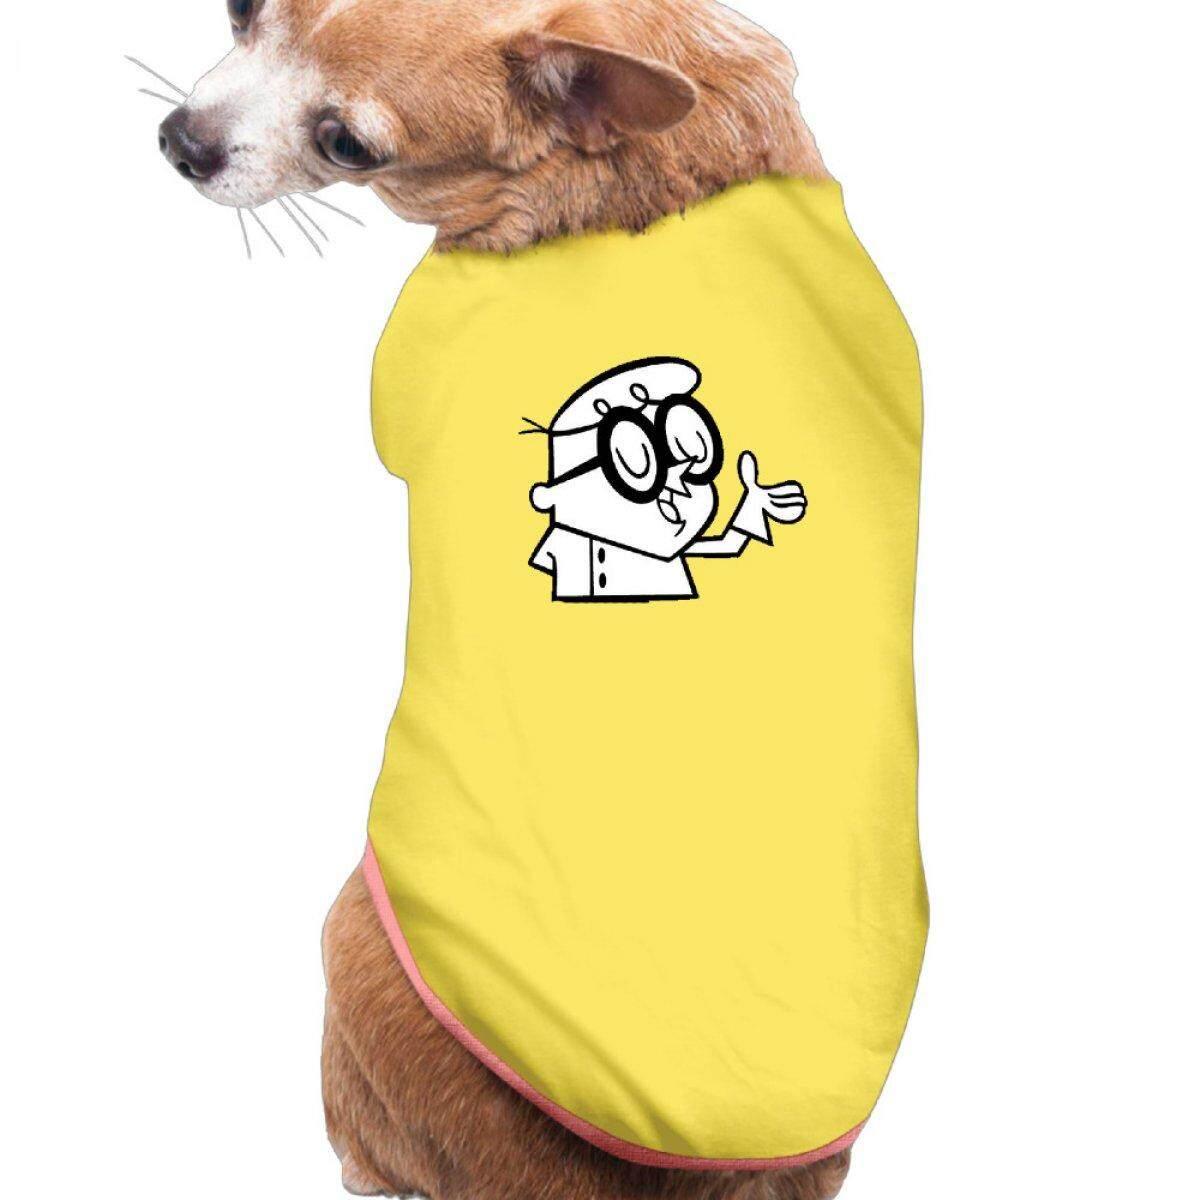 Dexter Laboratorium Hewan Peliharaan Persediaan Peliharaan T-shirt Anjing T Shirt-Internasional